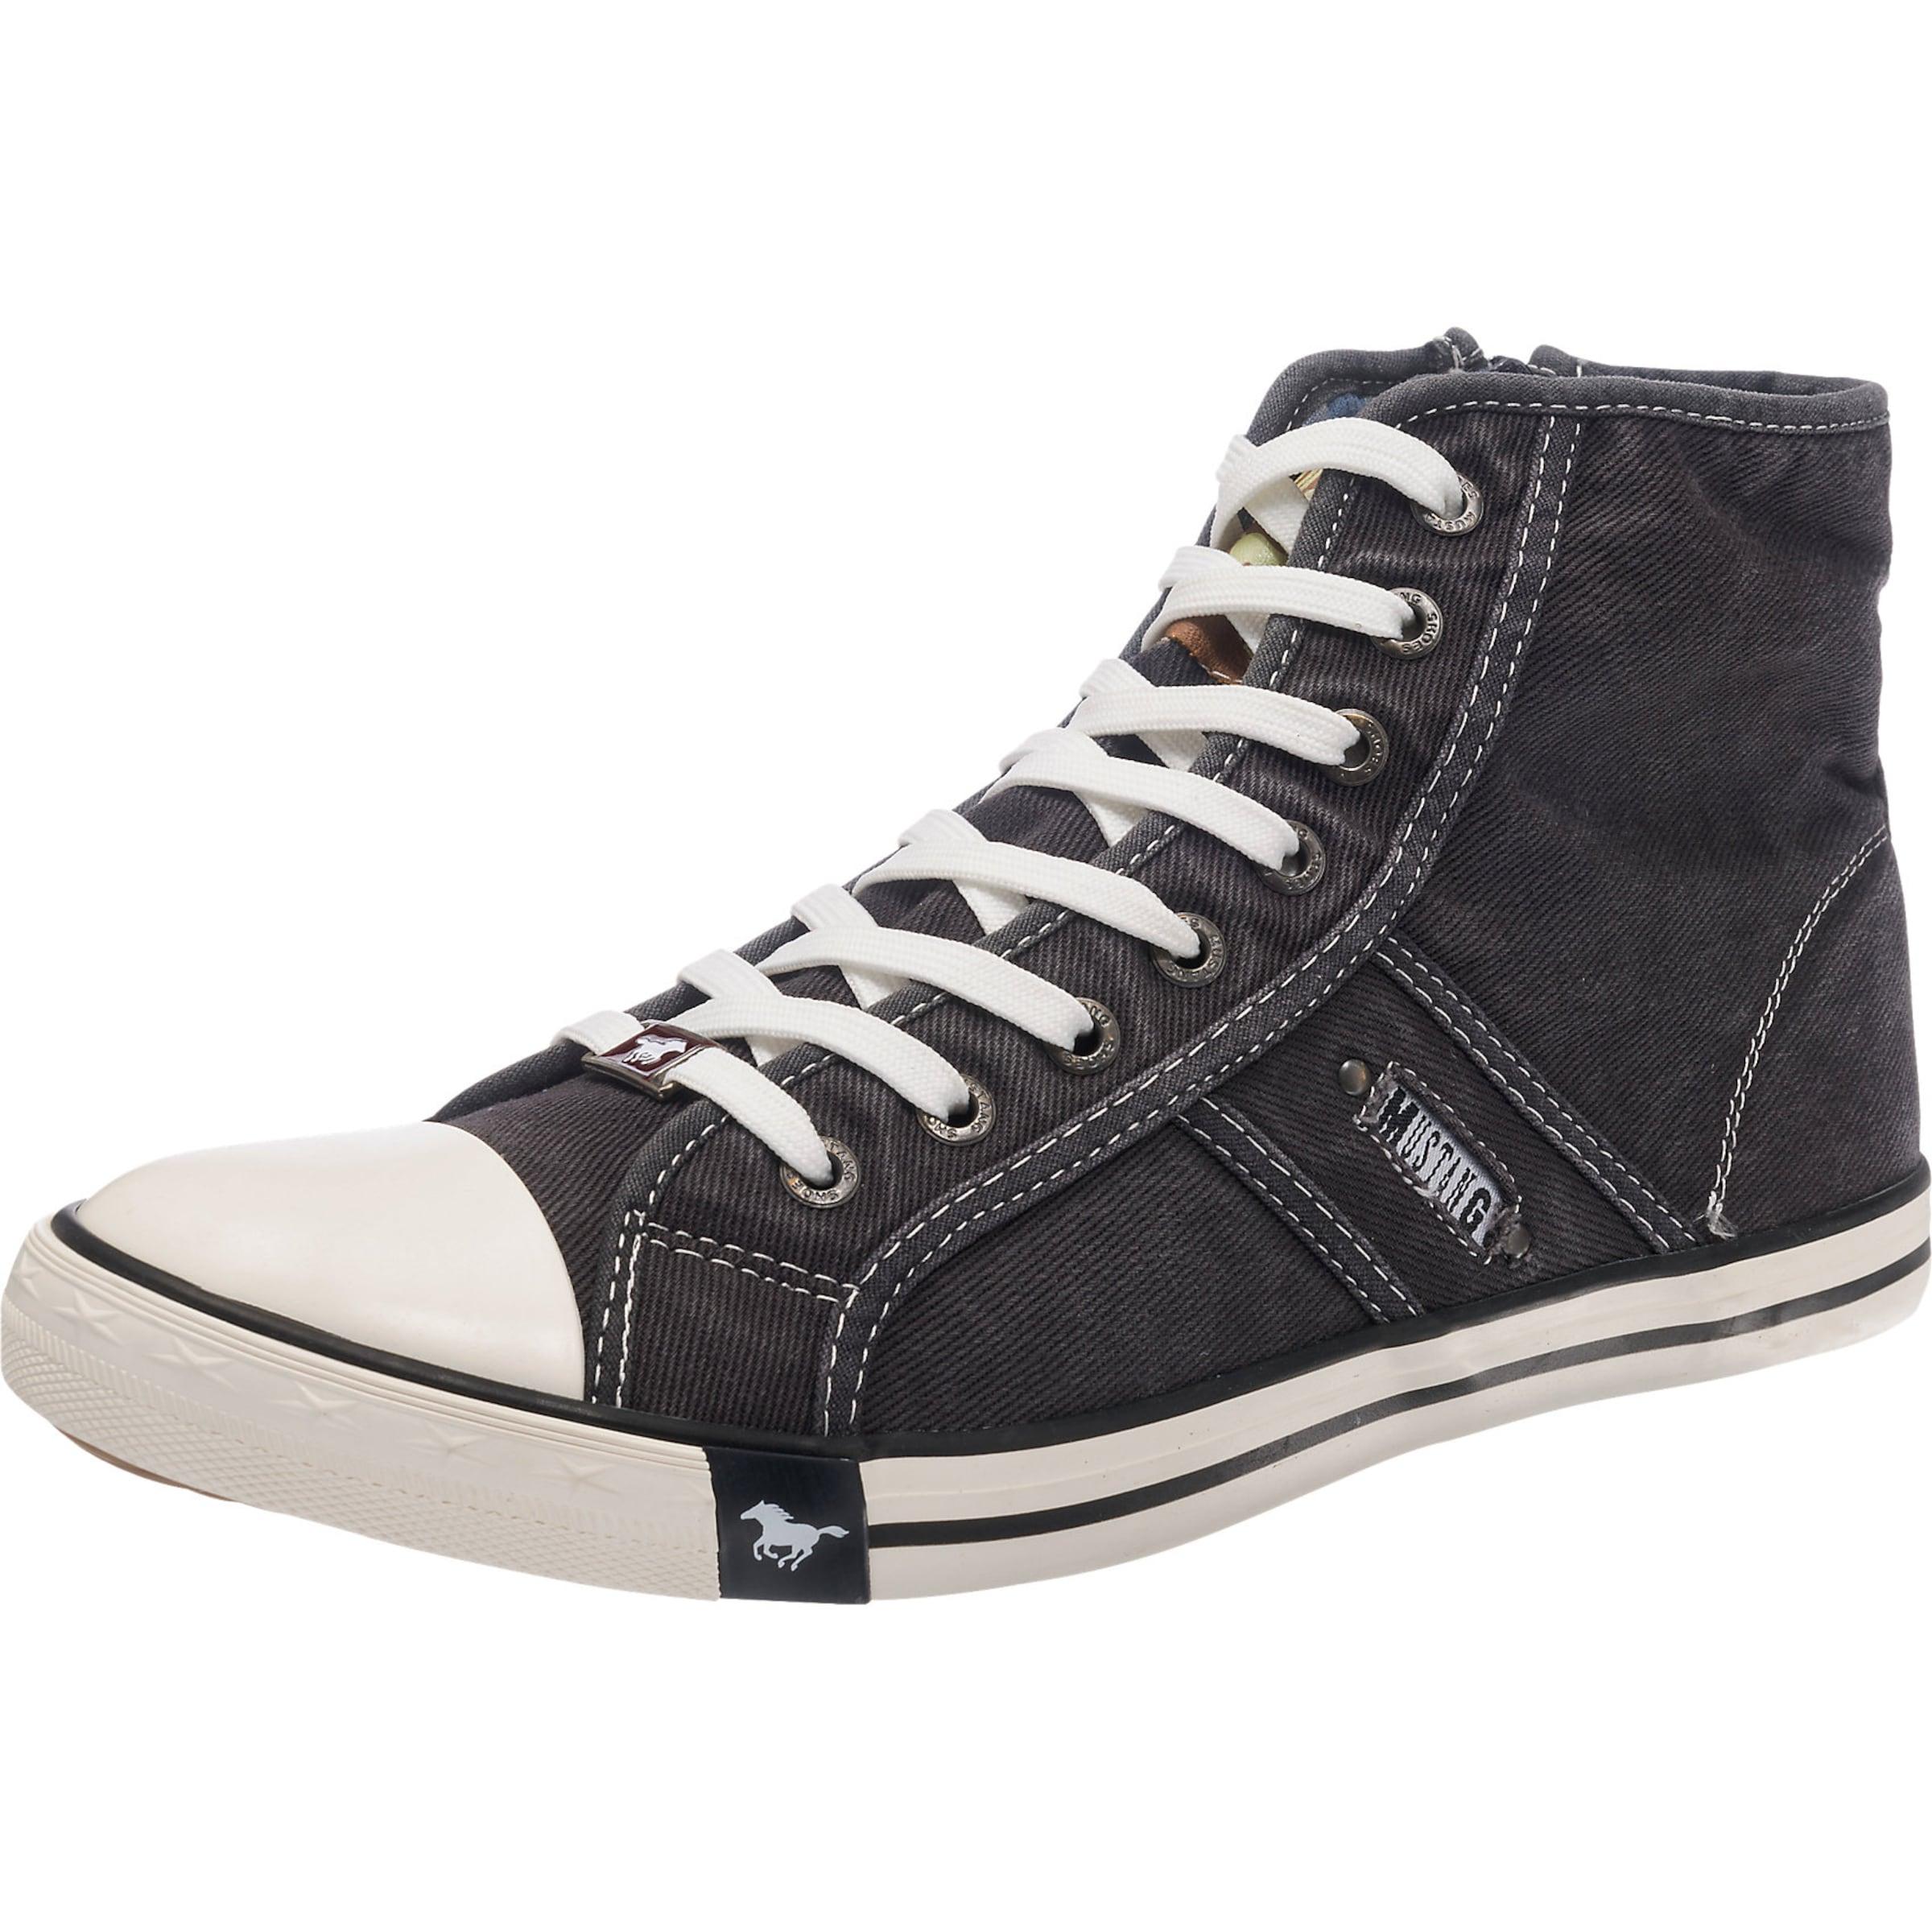 MUSTANG SHOES Booty Verschleißfeste billige Schuhe